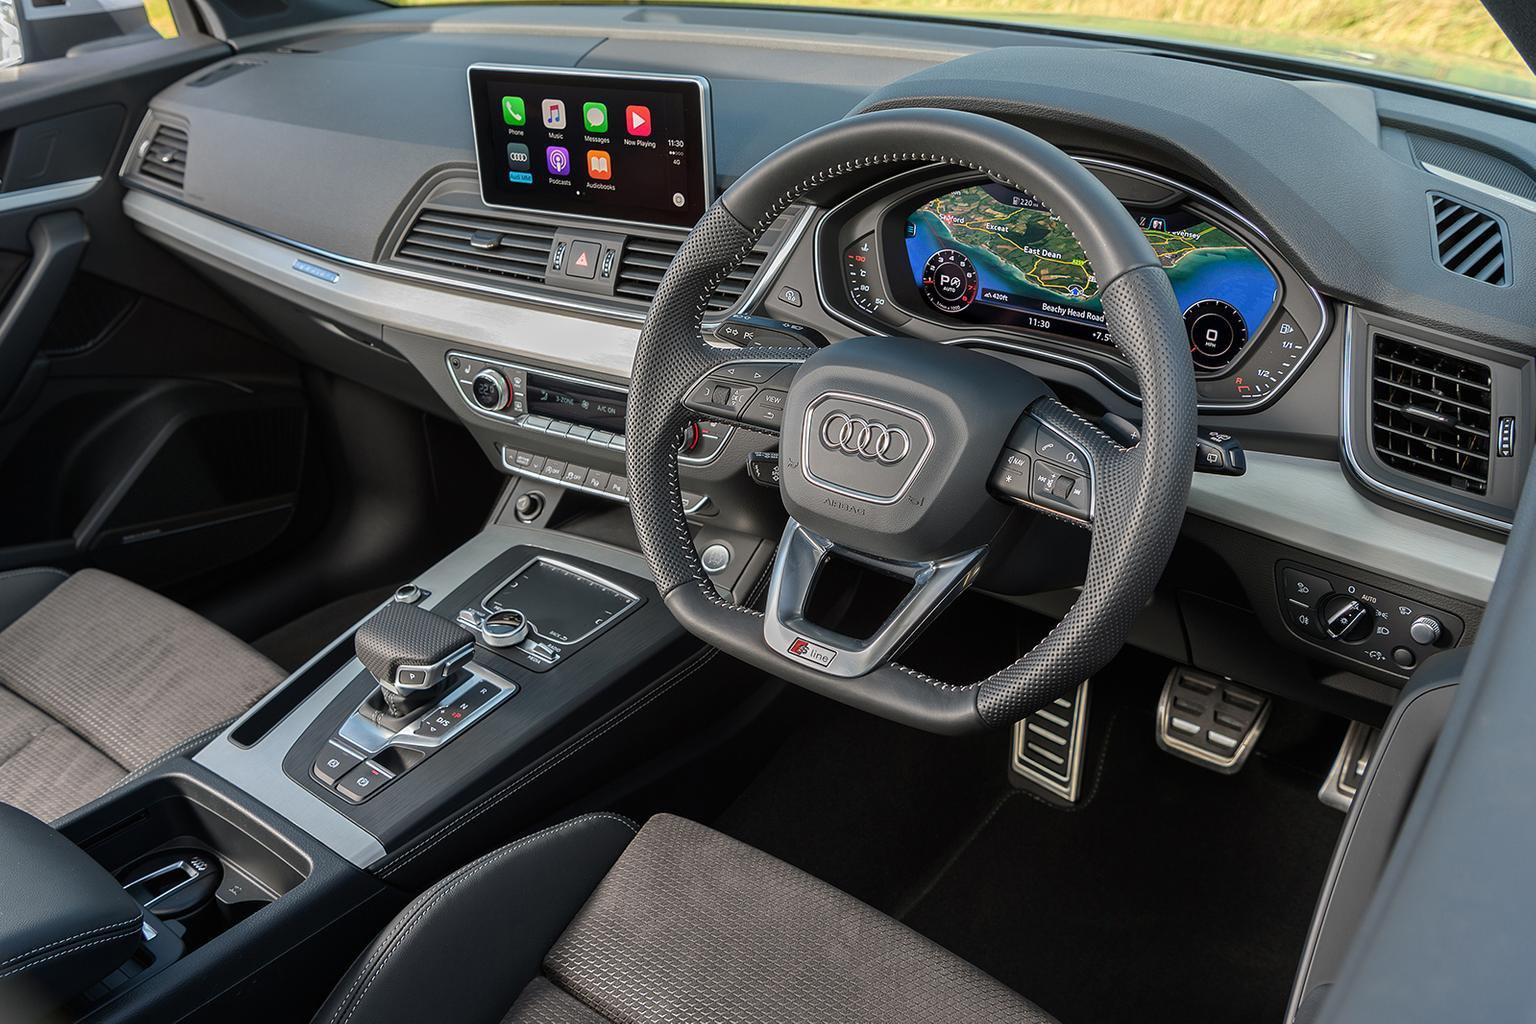 Audi Q5 2.0 TFSI 252 quattro S tronic review 2017